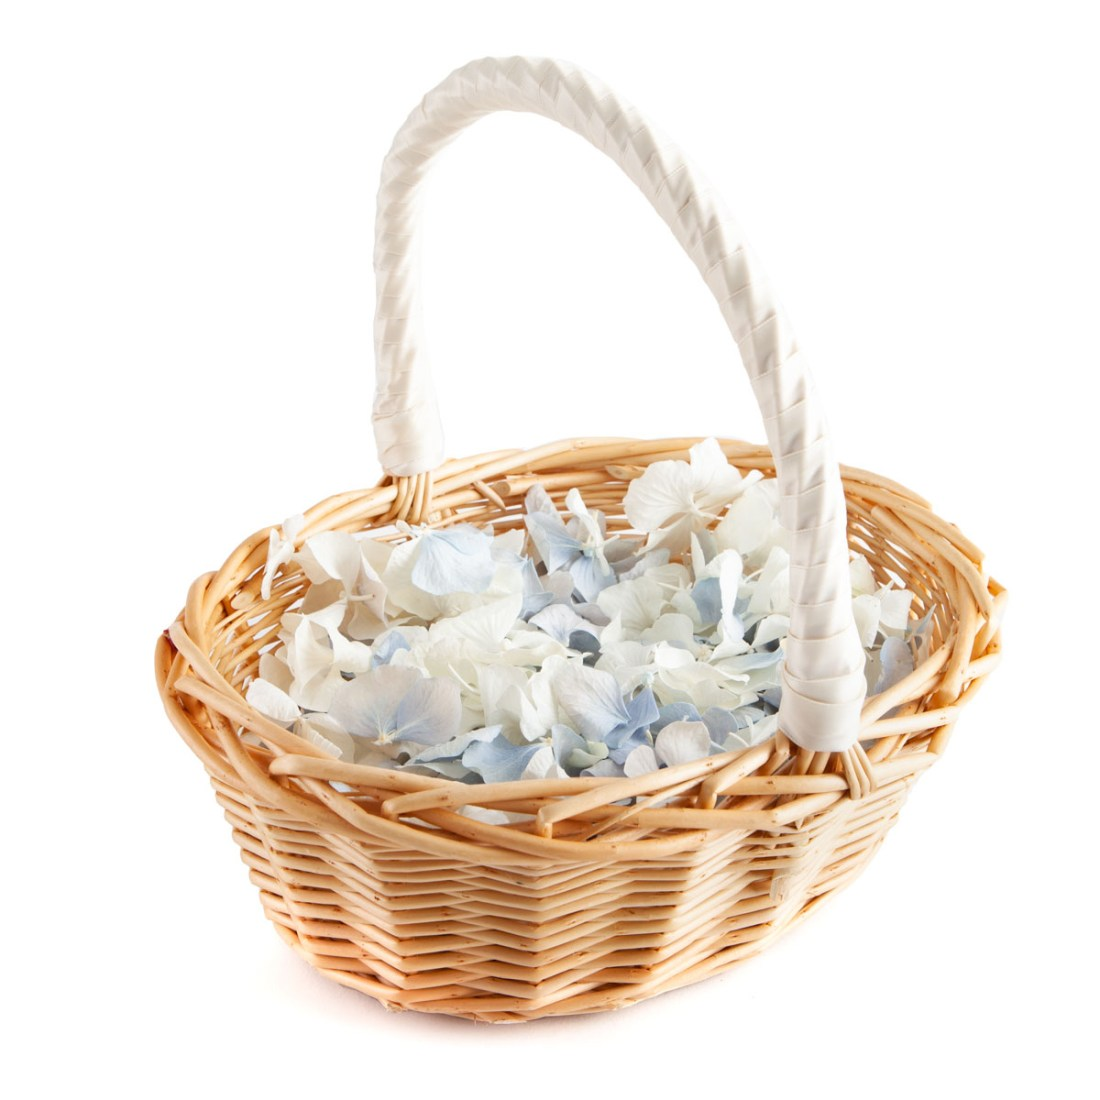 Biodegradable Confetti - Blue & White Hydrangea Petals - Flower Girl Basket